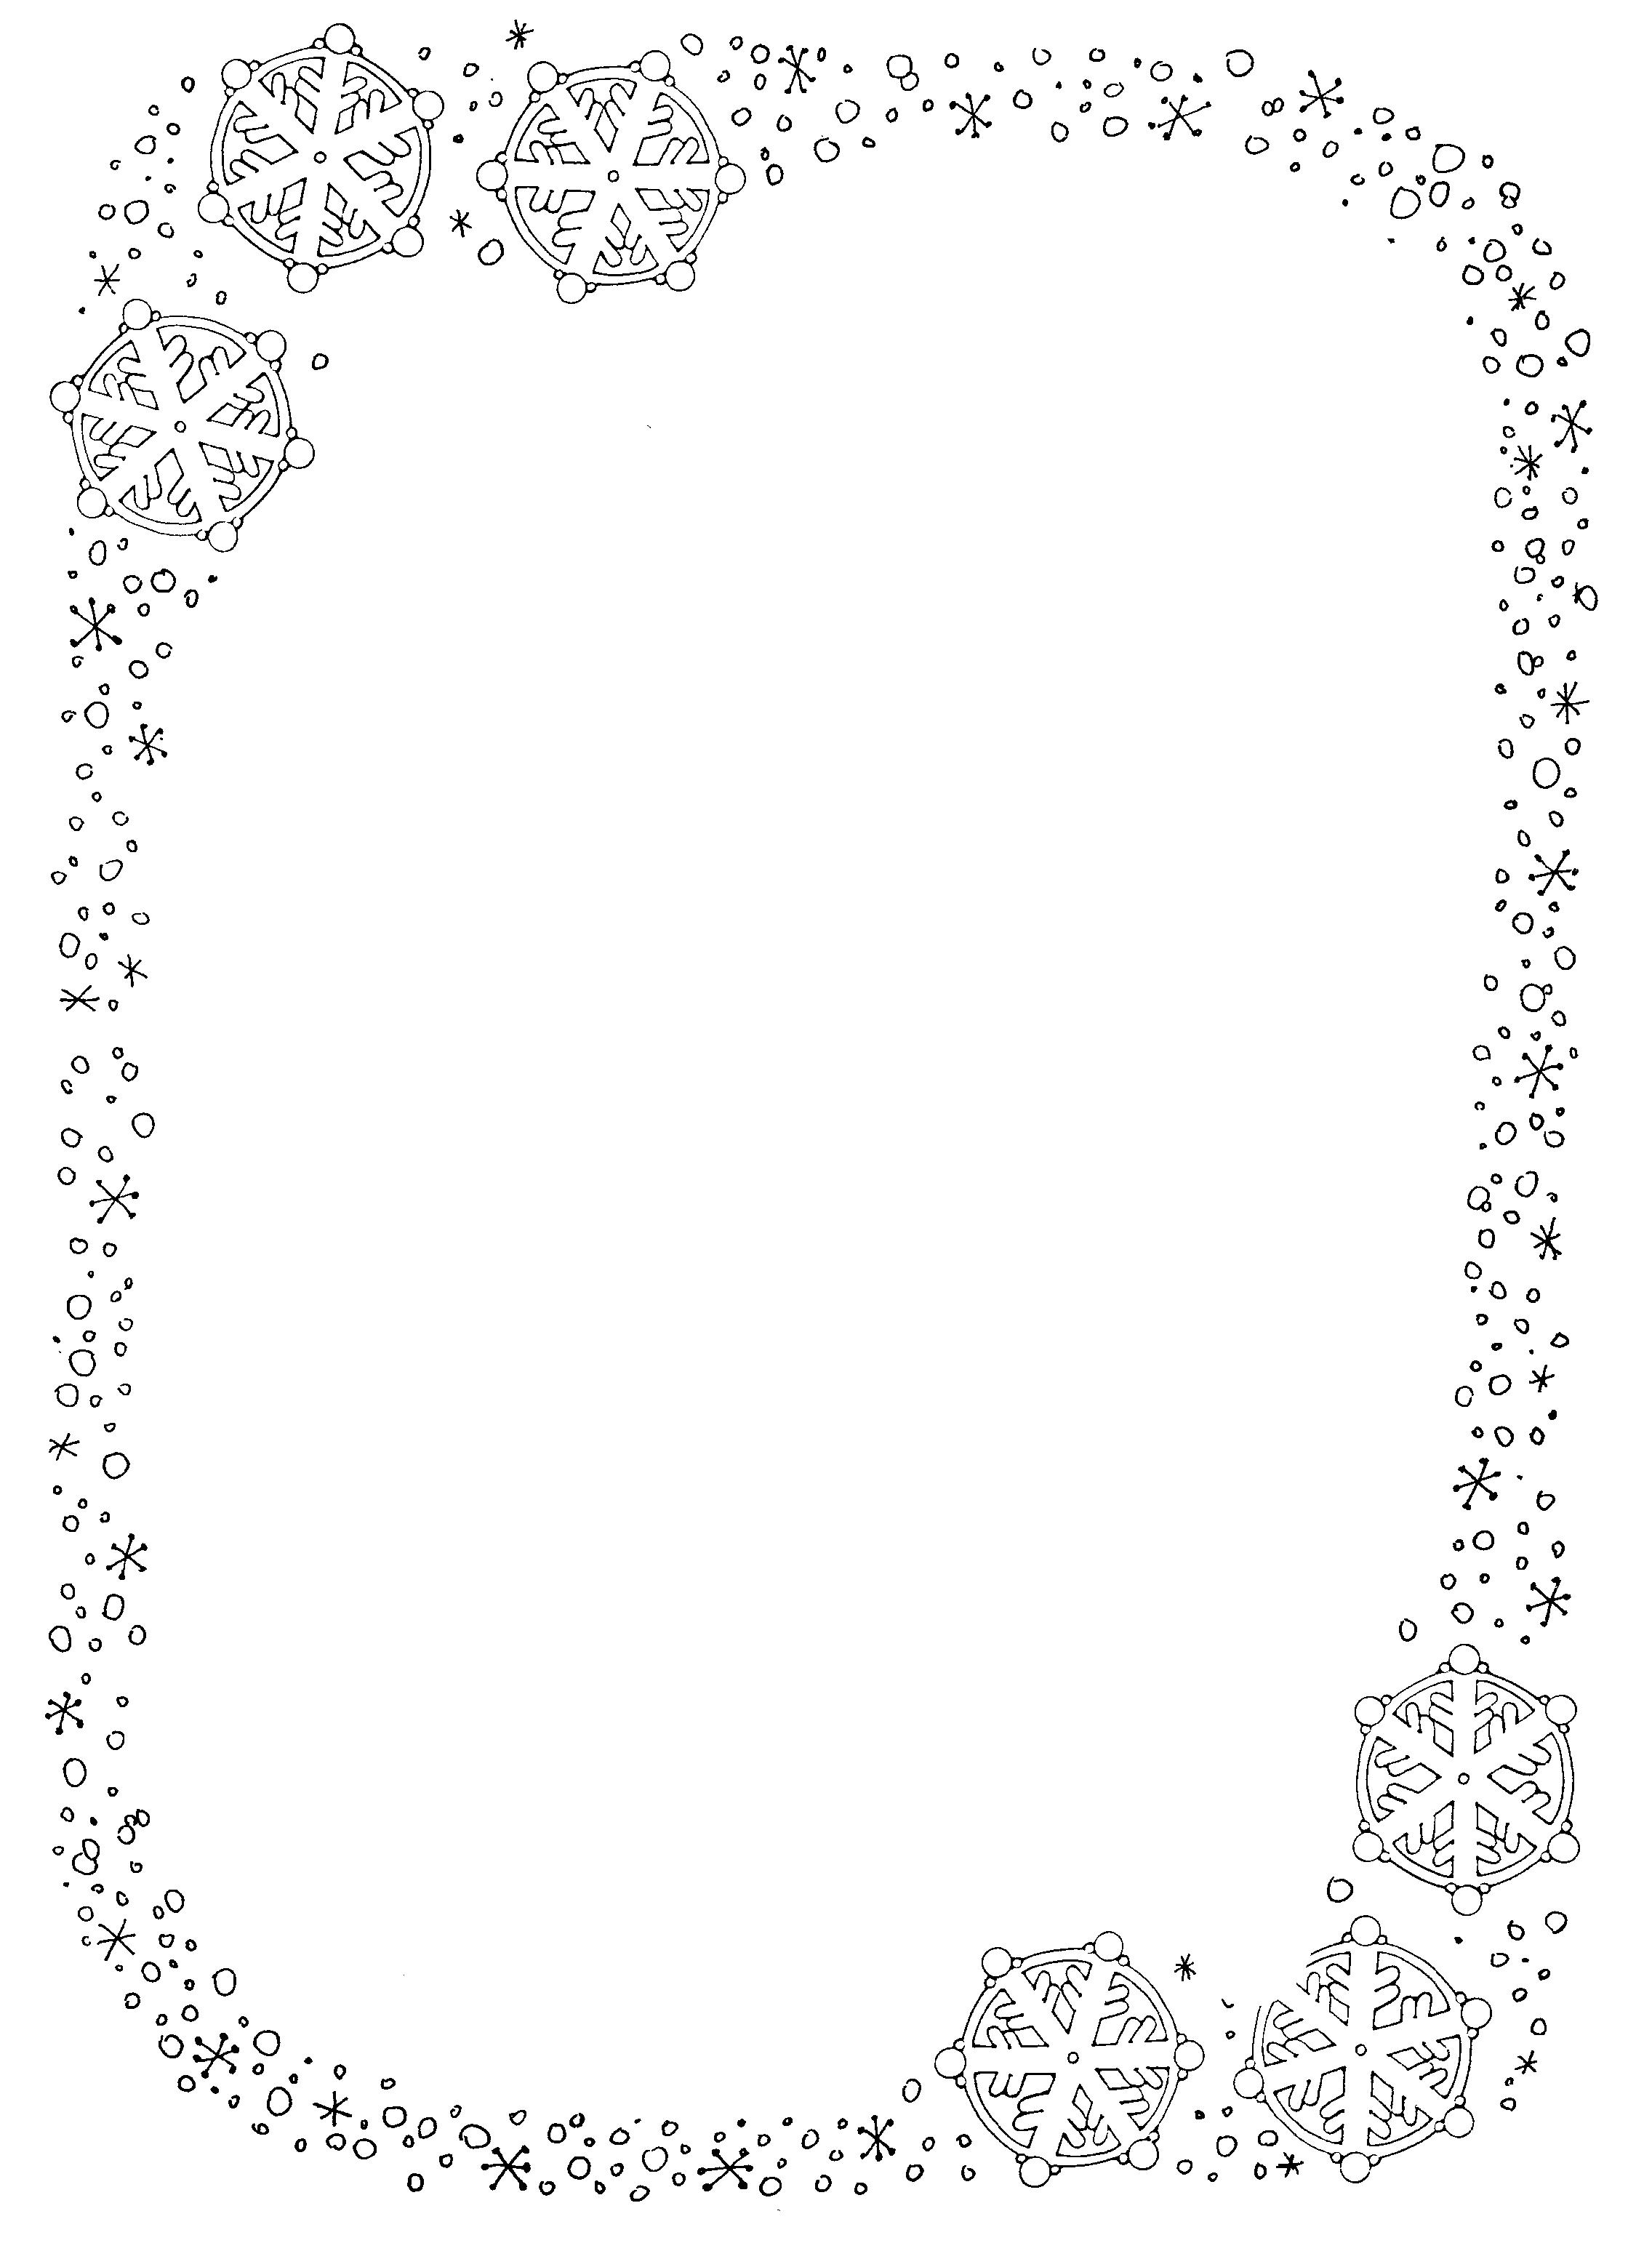 Best Images of Printable Winter Border Clip Art - Snowflake ...